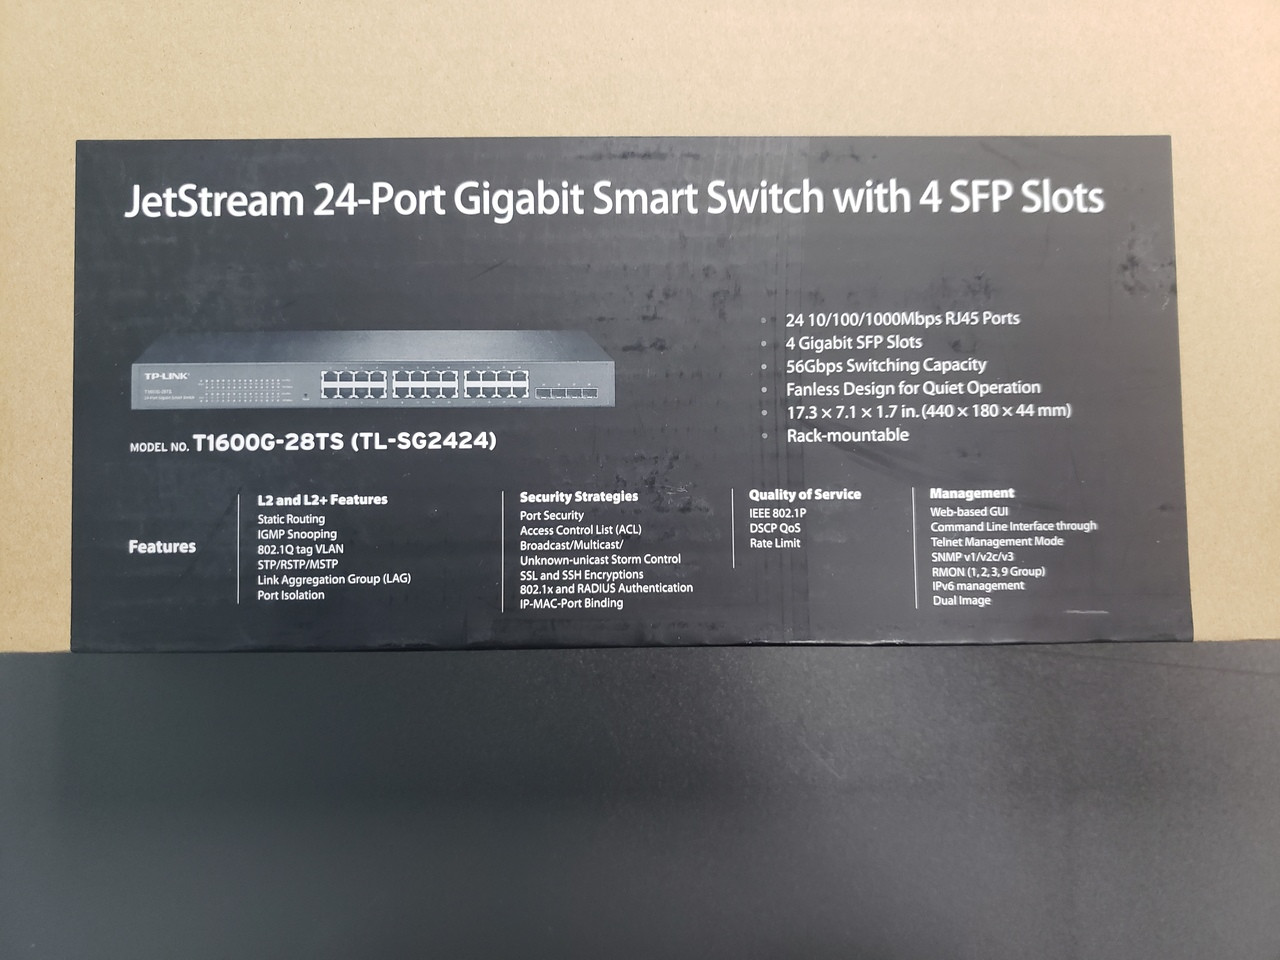 Brand New TP-LINK TL-SG2424 24-Port Gigabit Smart Switch In Original Box